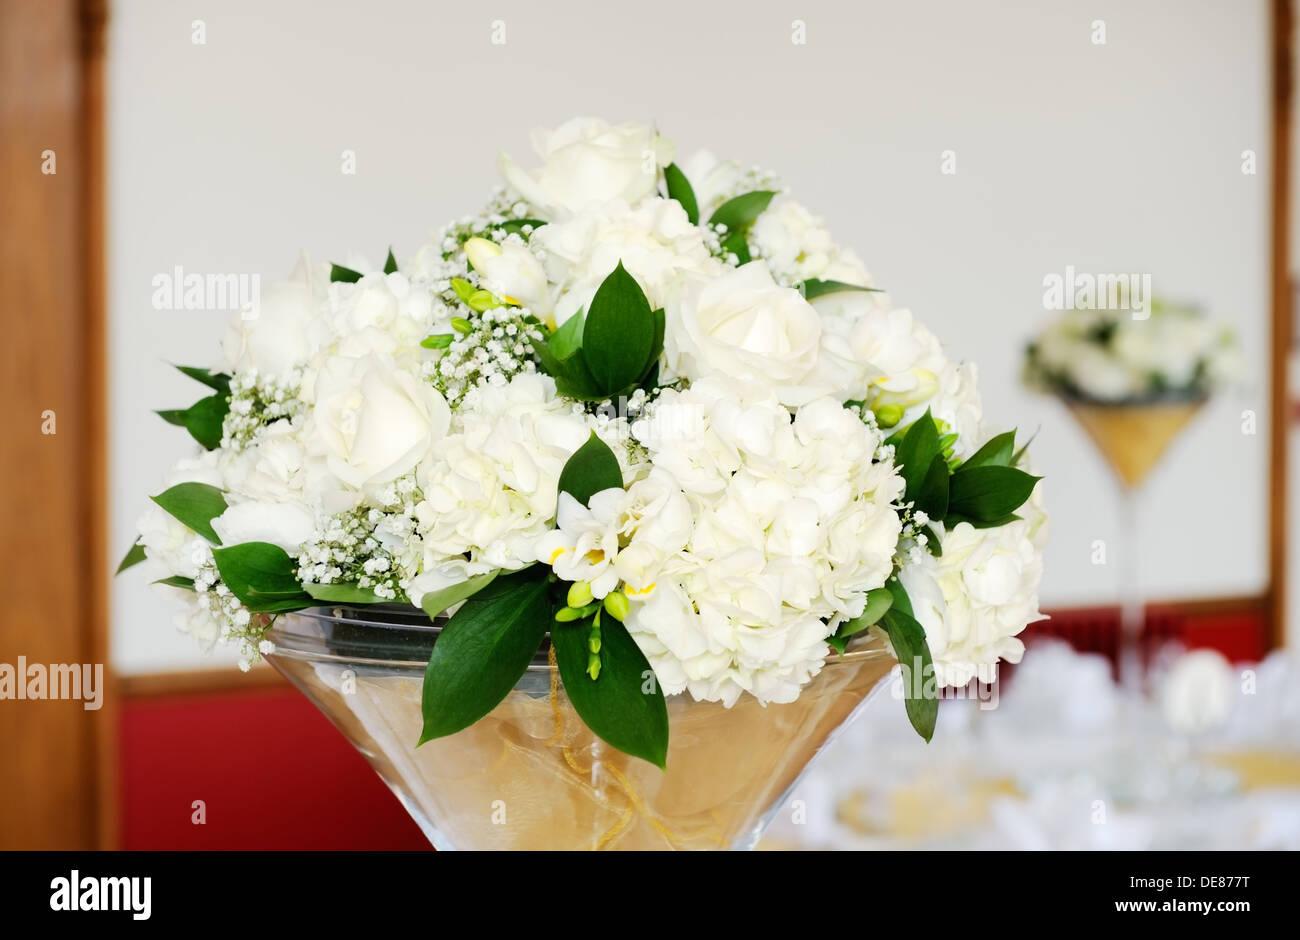 wedding reception white floral arrangements decorating tables